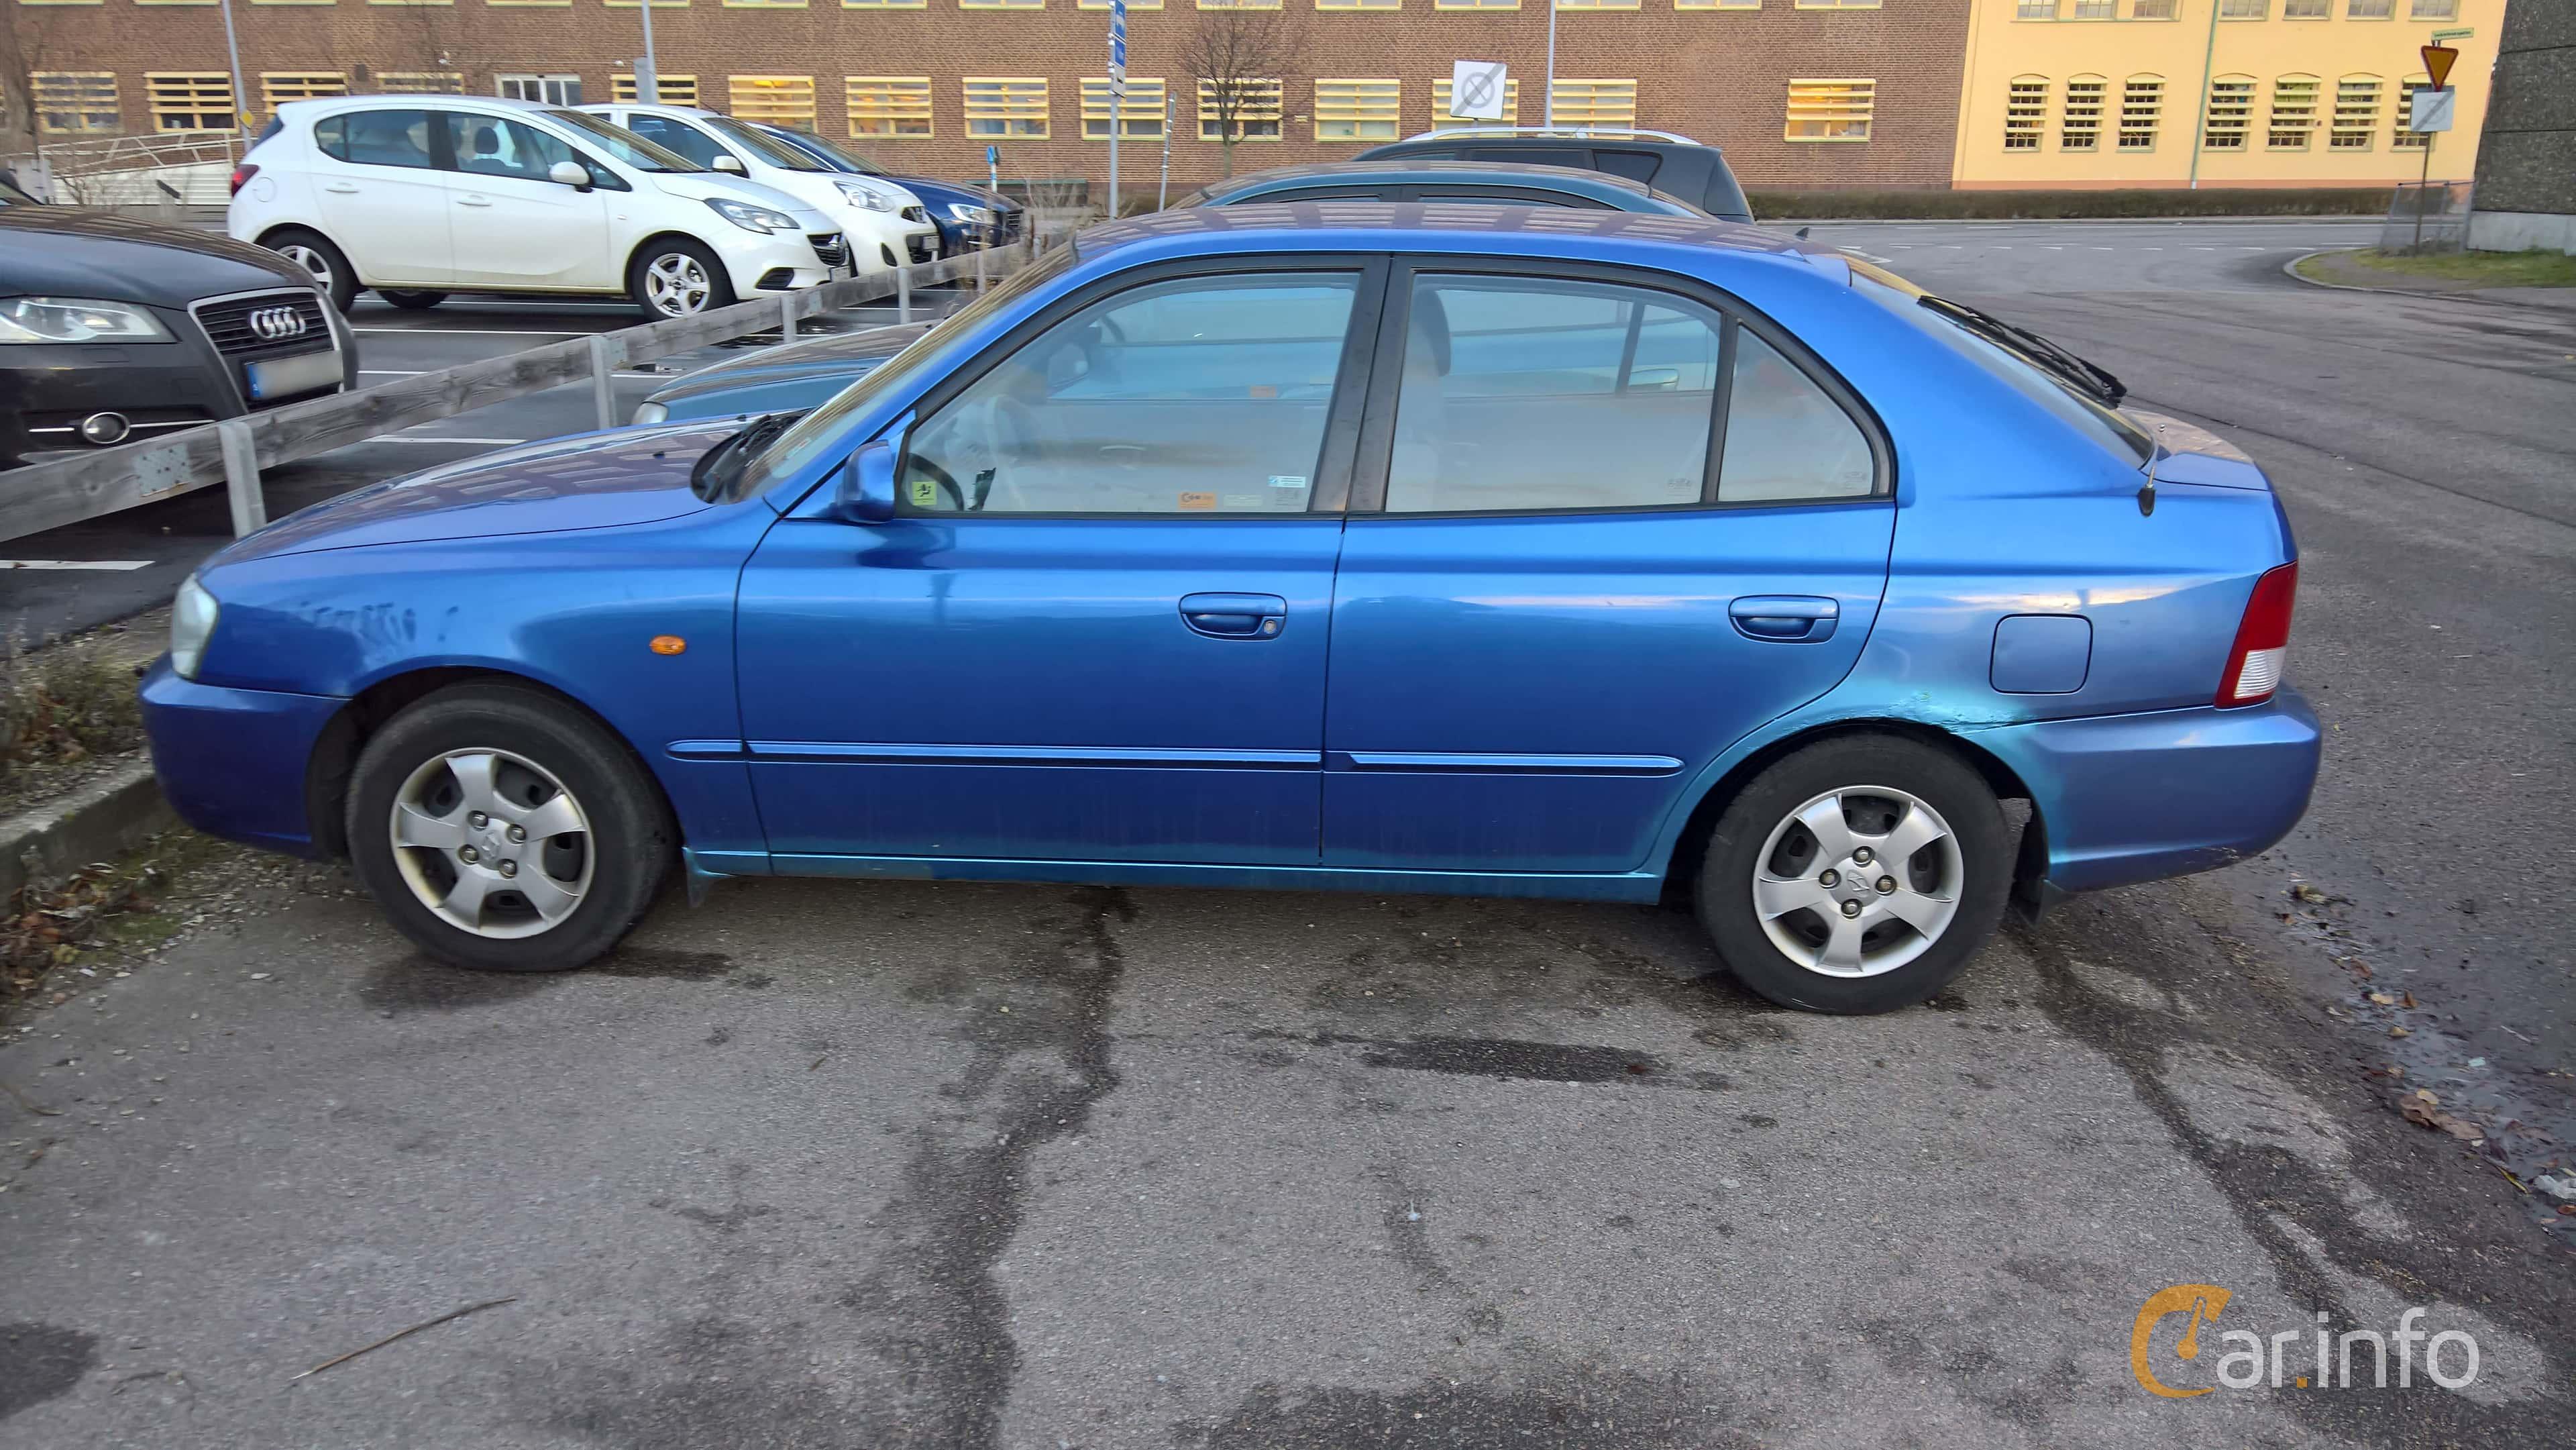 Hyundai Accent 5-door 1.5 Automatic, 90hp, 2000